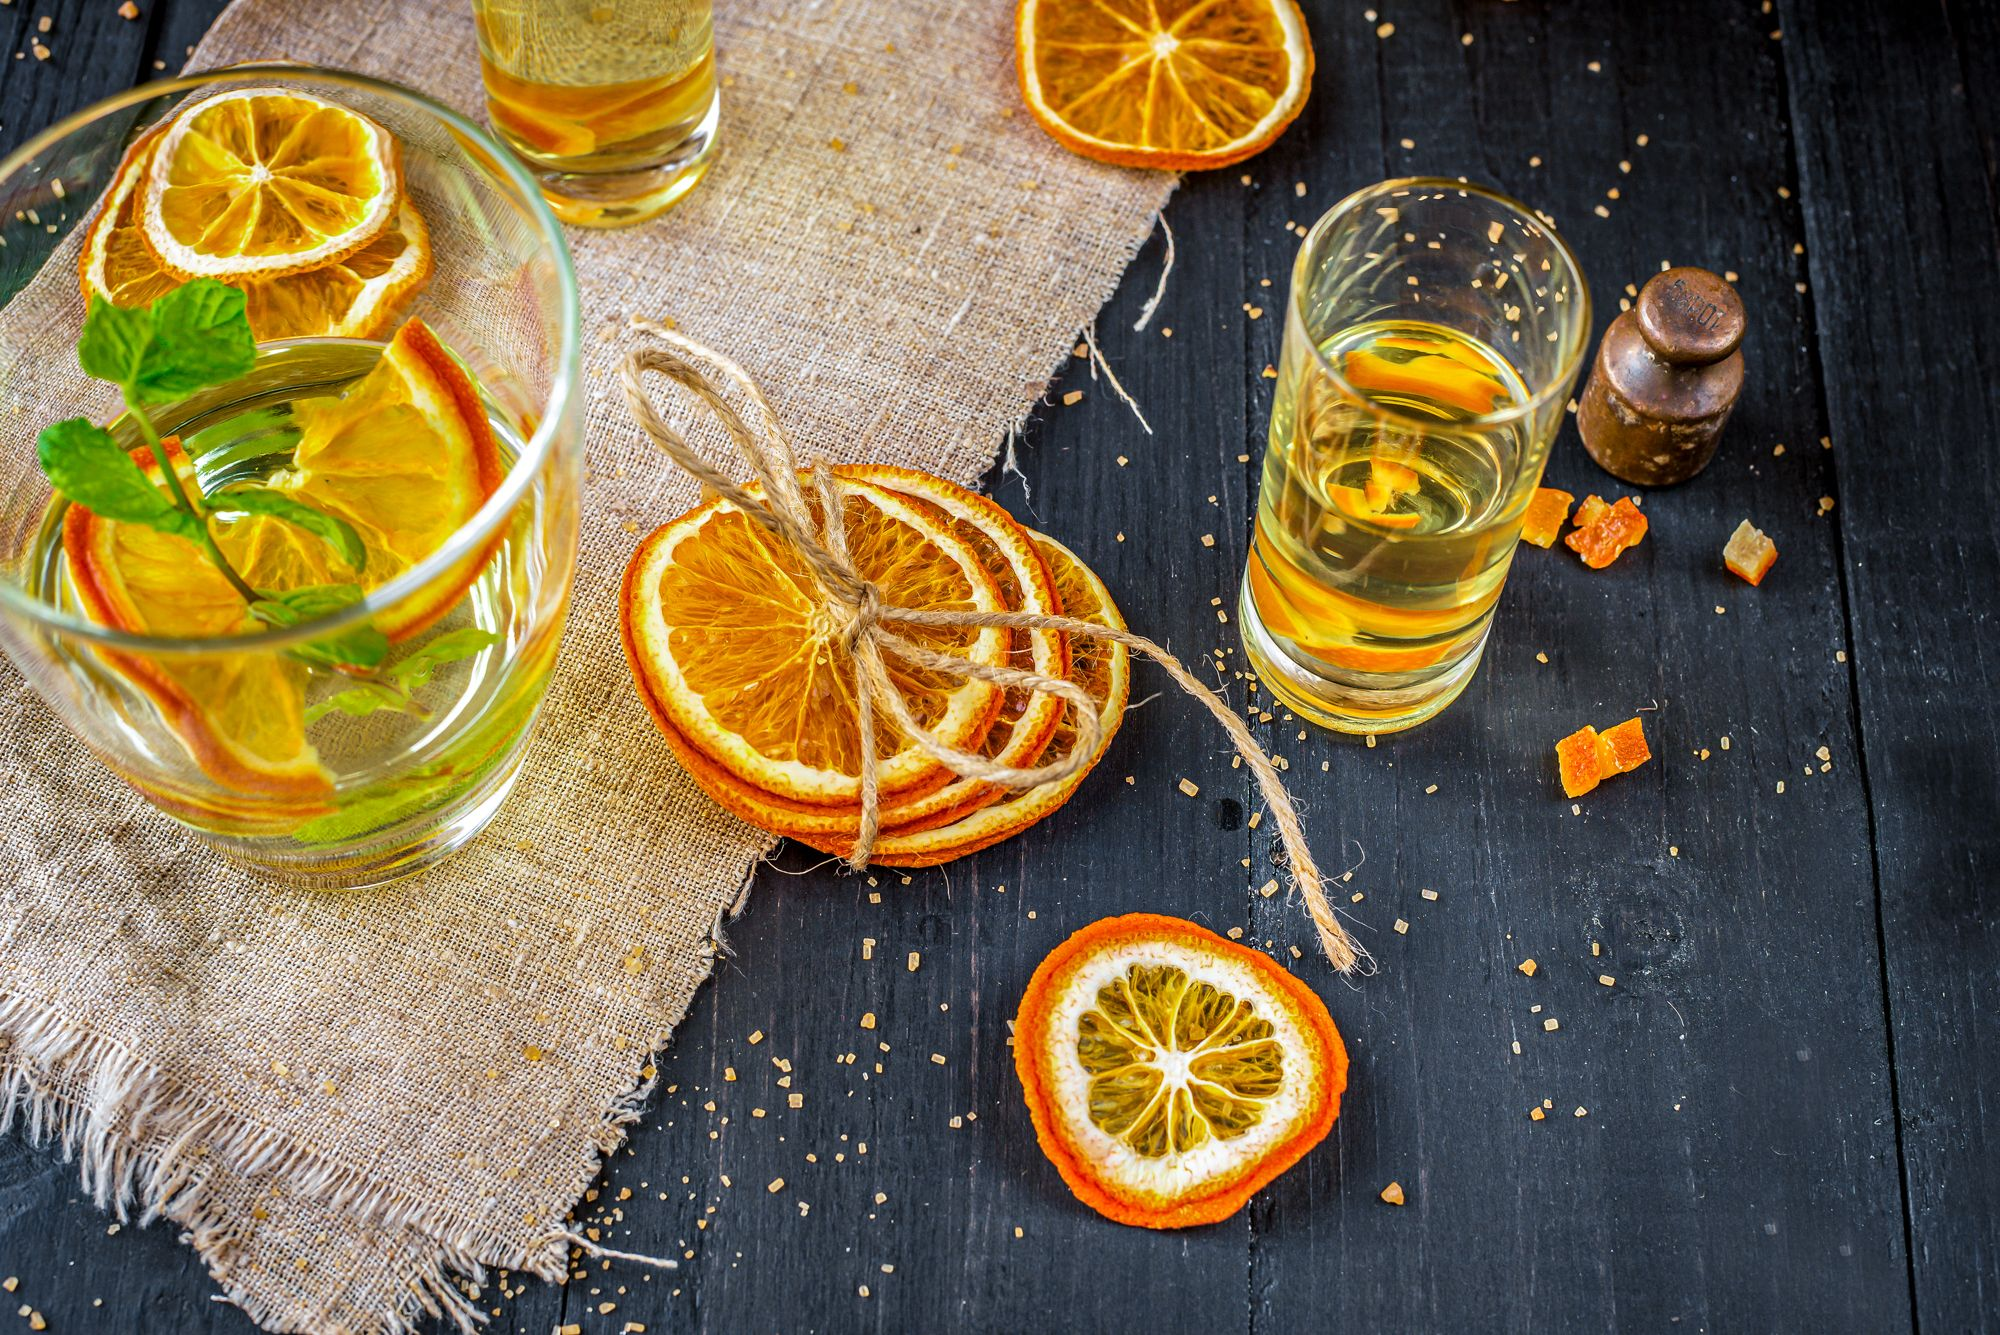 Curacao Orange Liqueur